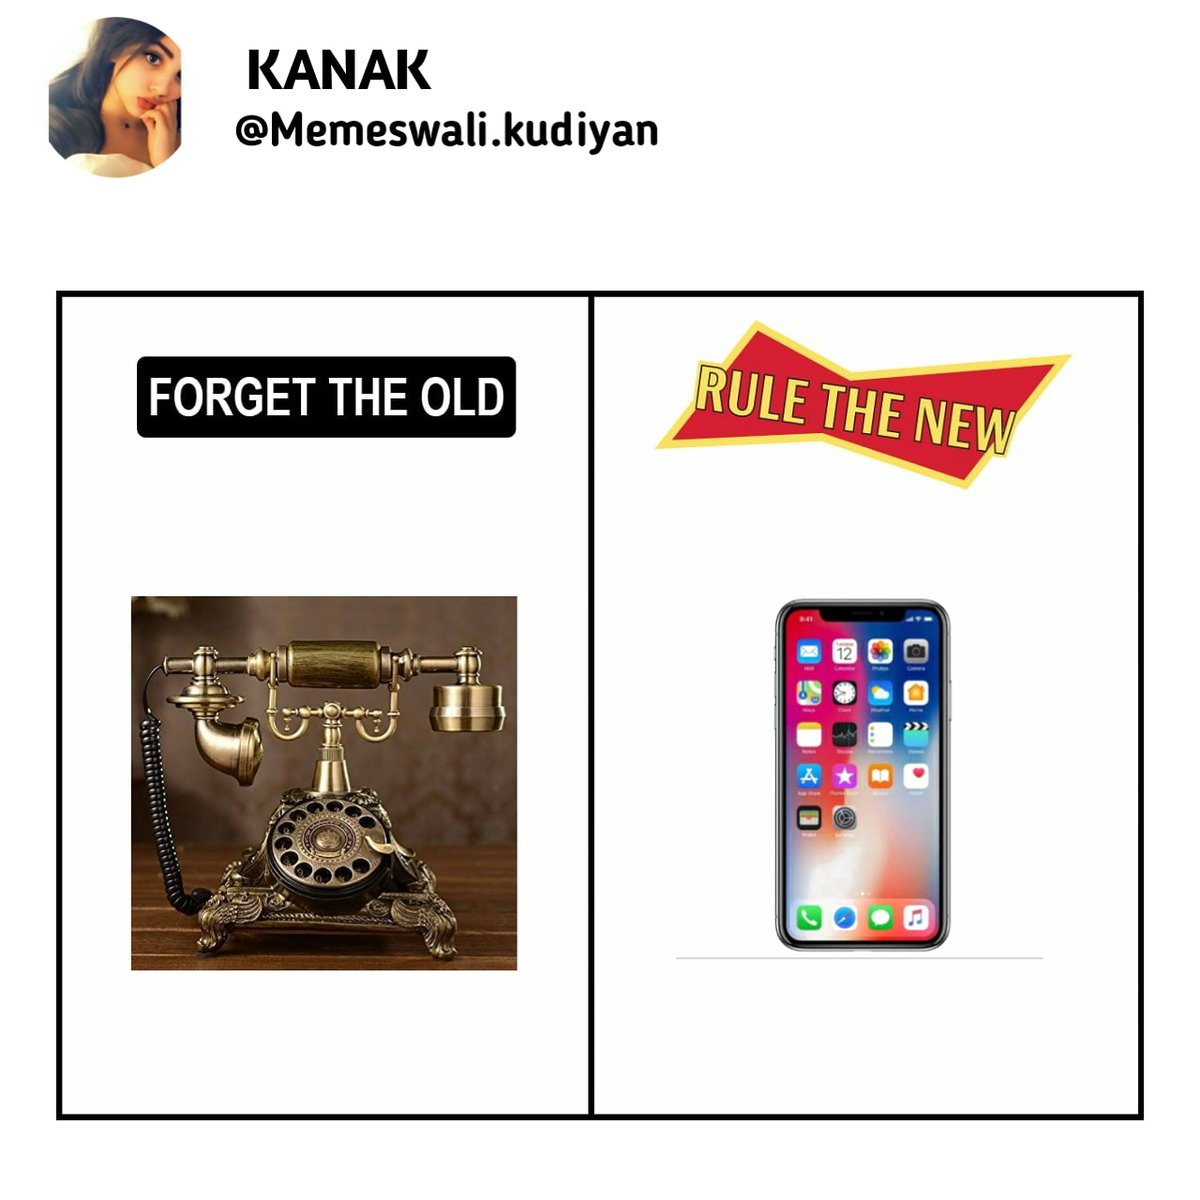 Follow for more❤️ @memeswali.kudiyan . #sadak2 #binod #funnytweets #funnymemes #lockdown #lockdownmemes #memes #dailymemes #epicmemes #bakchodi #trolls #trendingmemes #meme #memesdaily #chutiyapa  #superchutiya #bcbilli #indianmemes #sarcasm #troll #rvcjinsta #rvcj #RuleTheNew https://t.co/HTdl6hw5pl